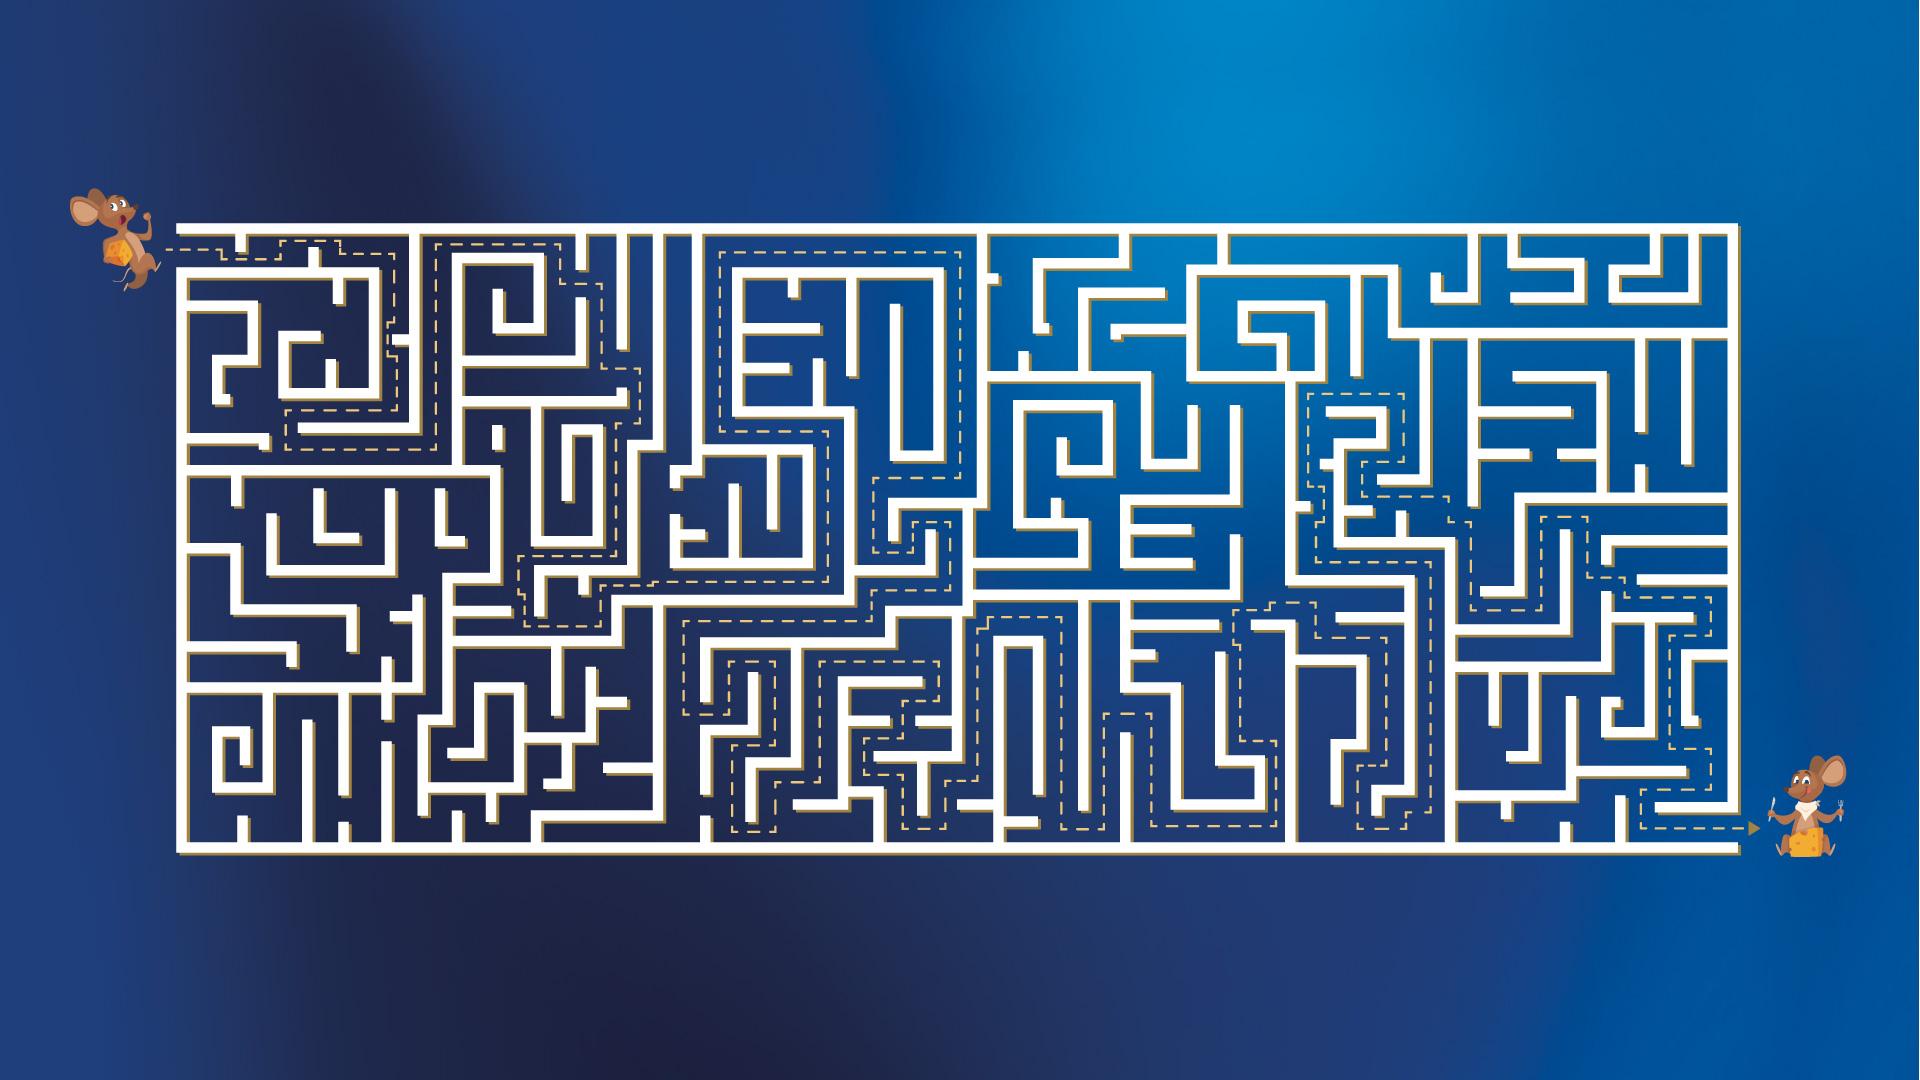 Kugel-Labyrinth